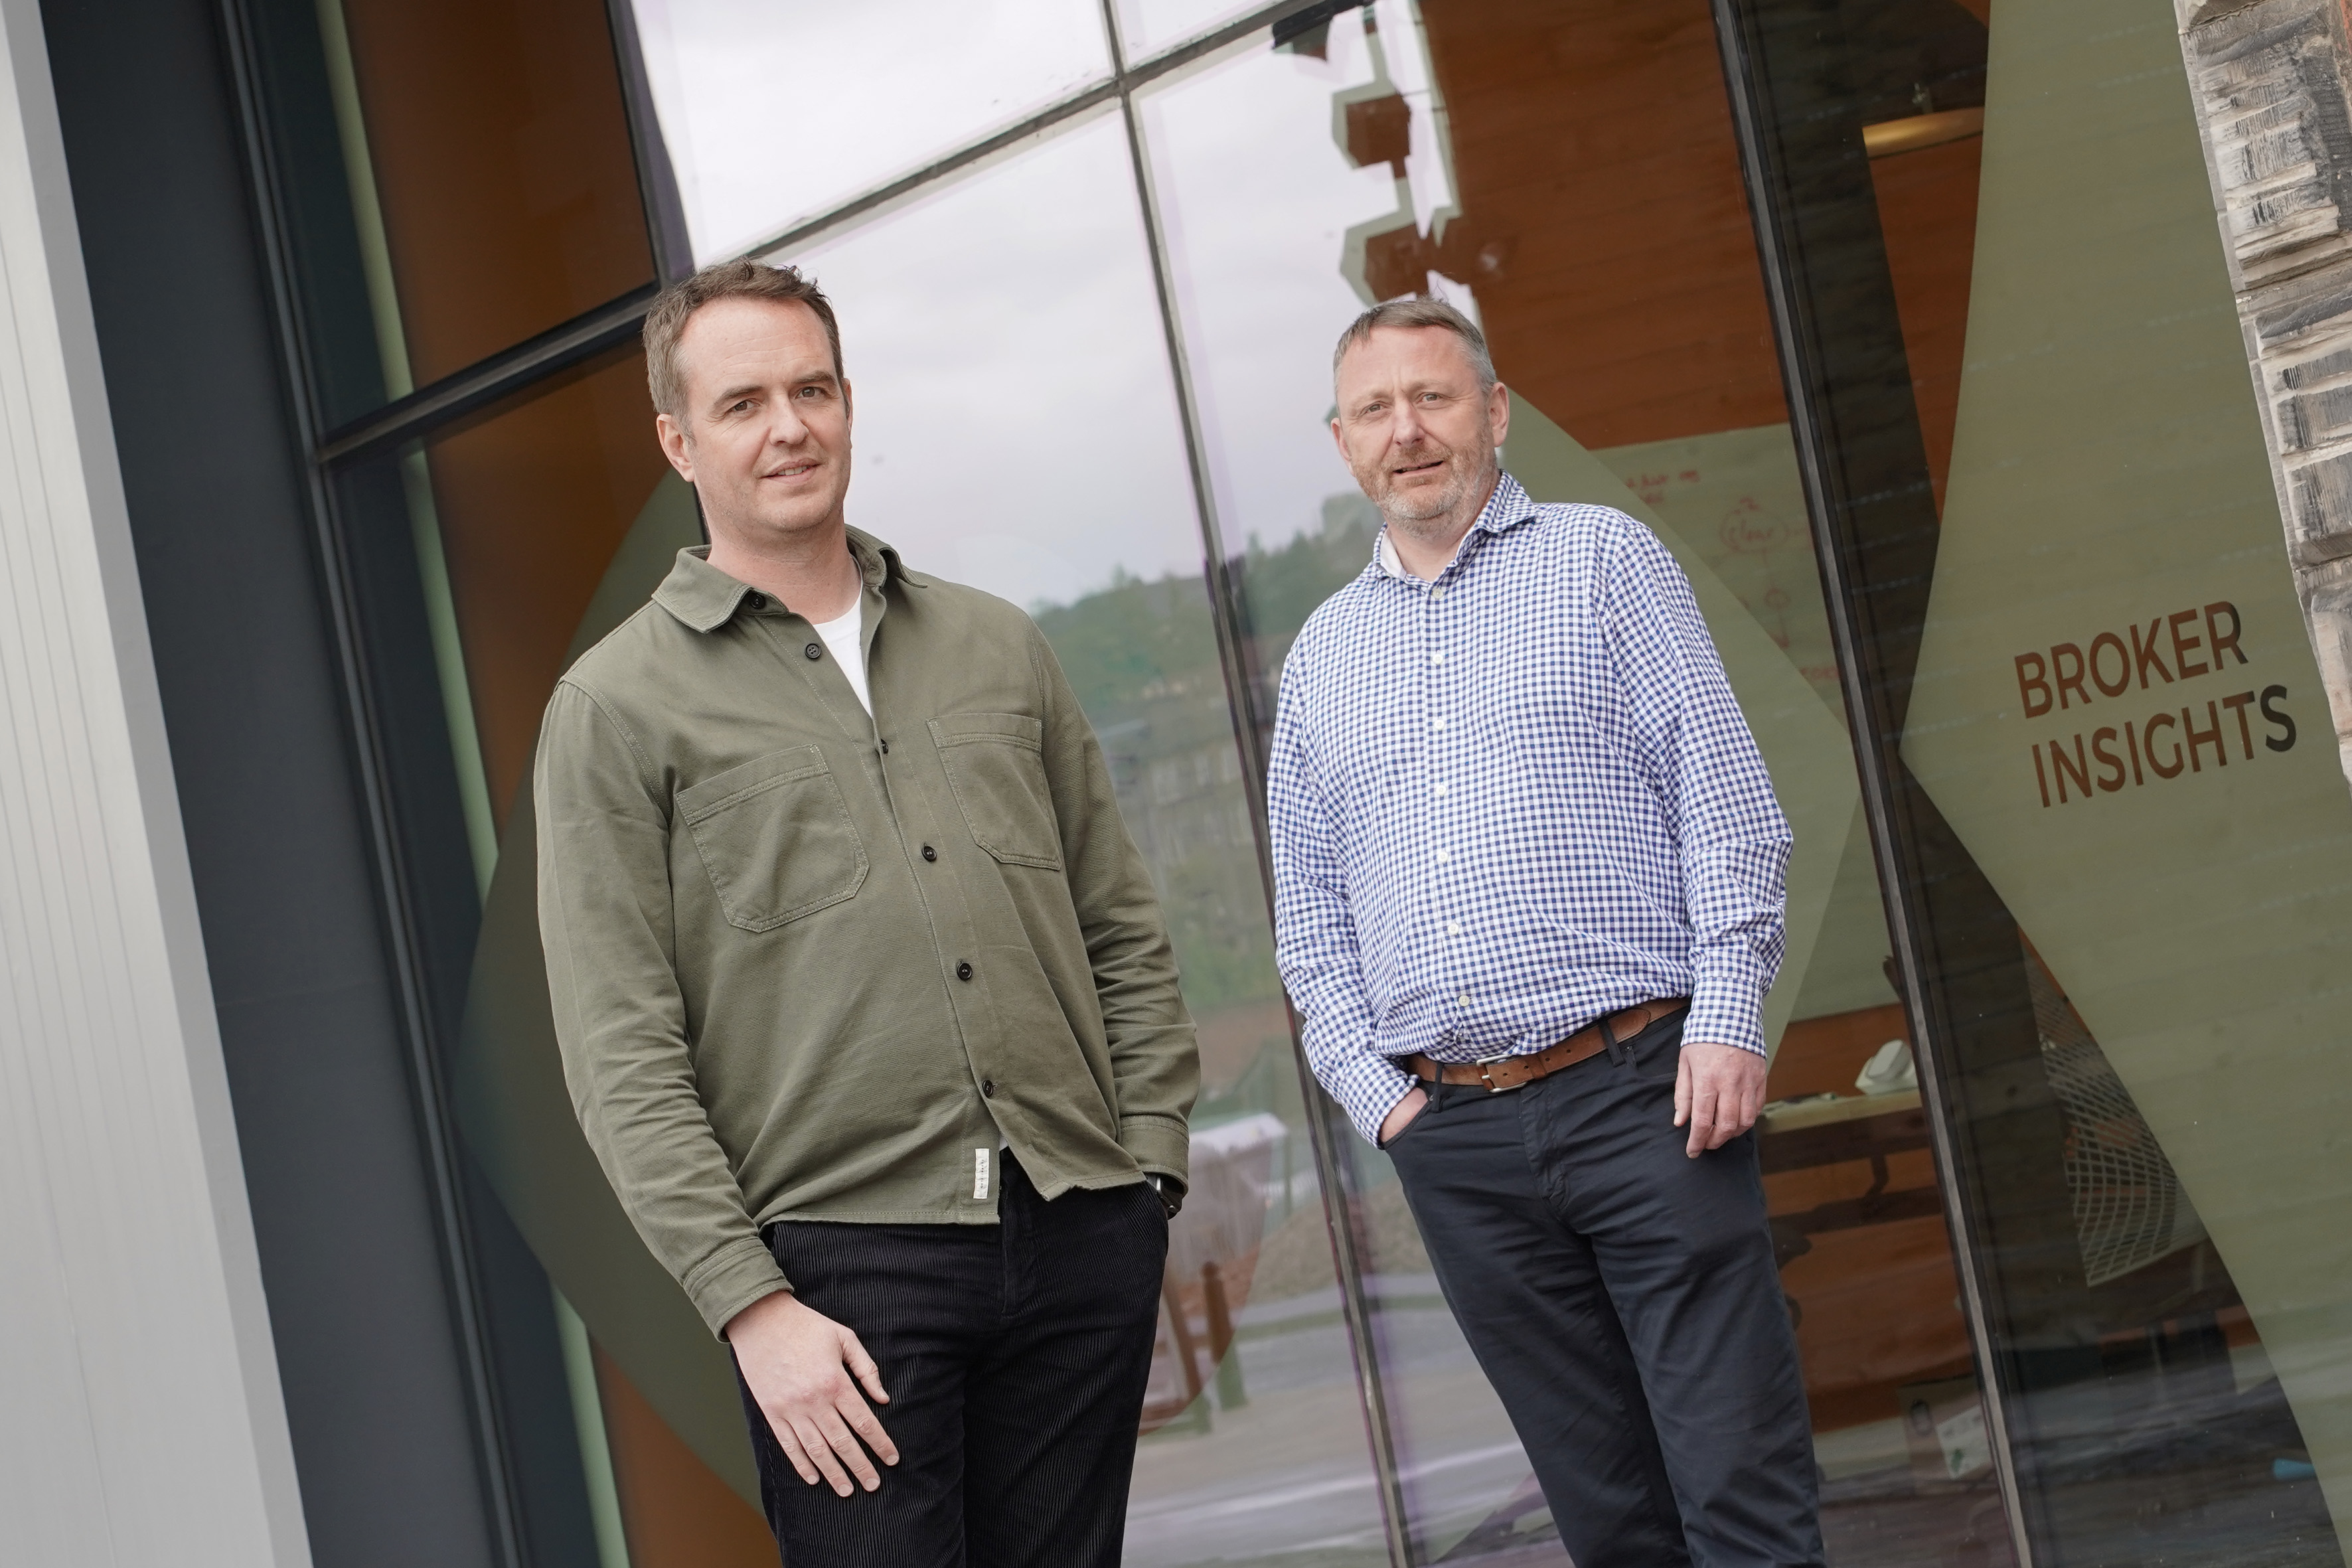 Insurtech start-up Broker Insights boasts doubled revenue